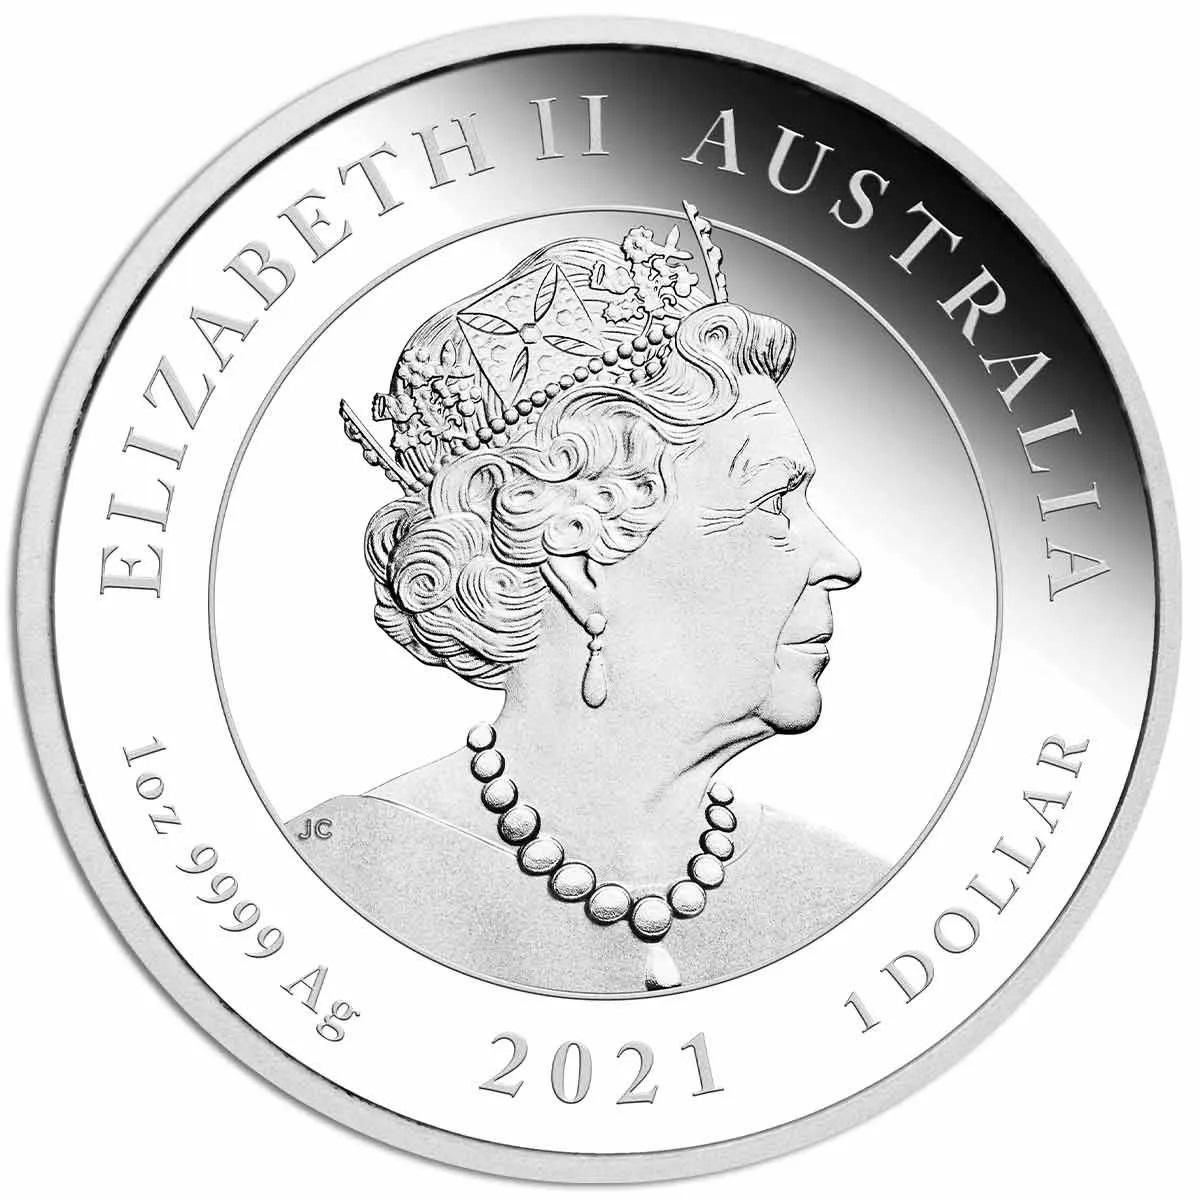 Австралия серебрянная монета 1 доллар 2021 год, аверс